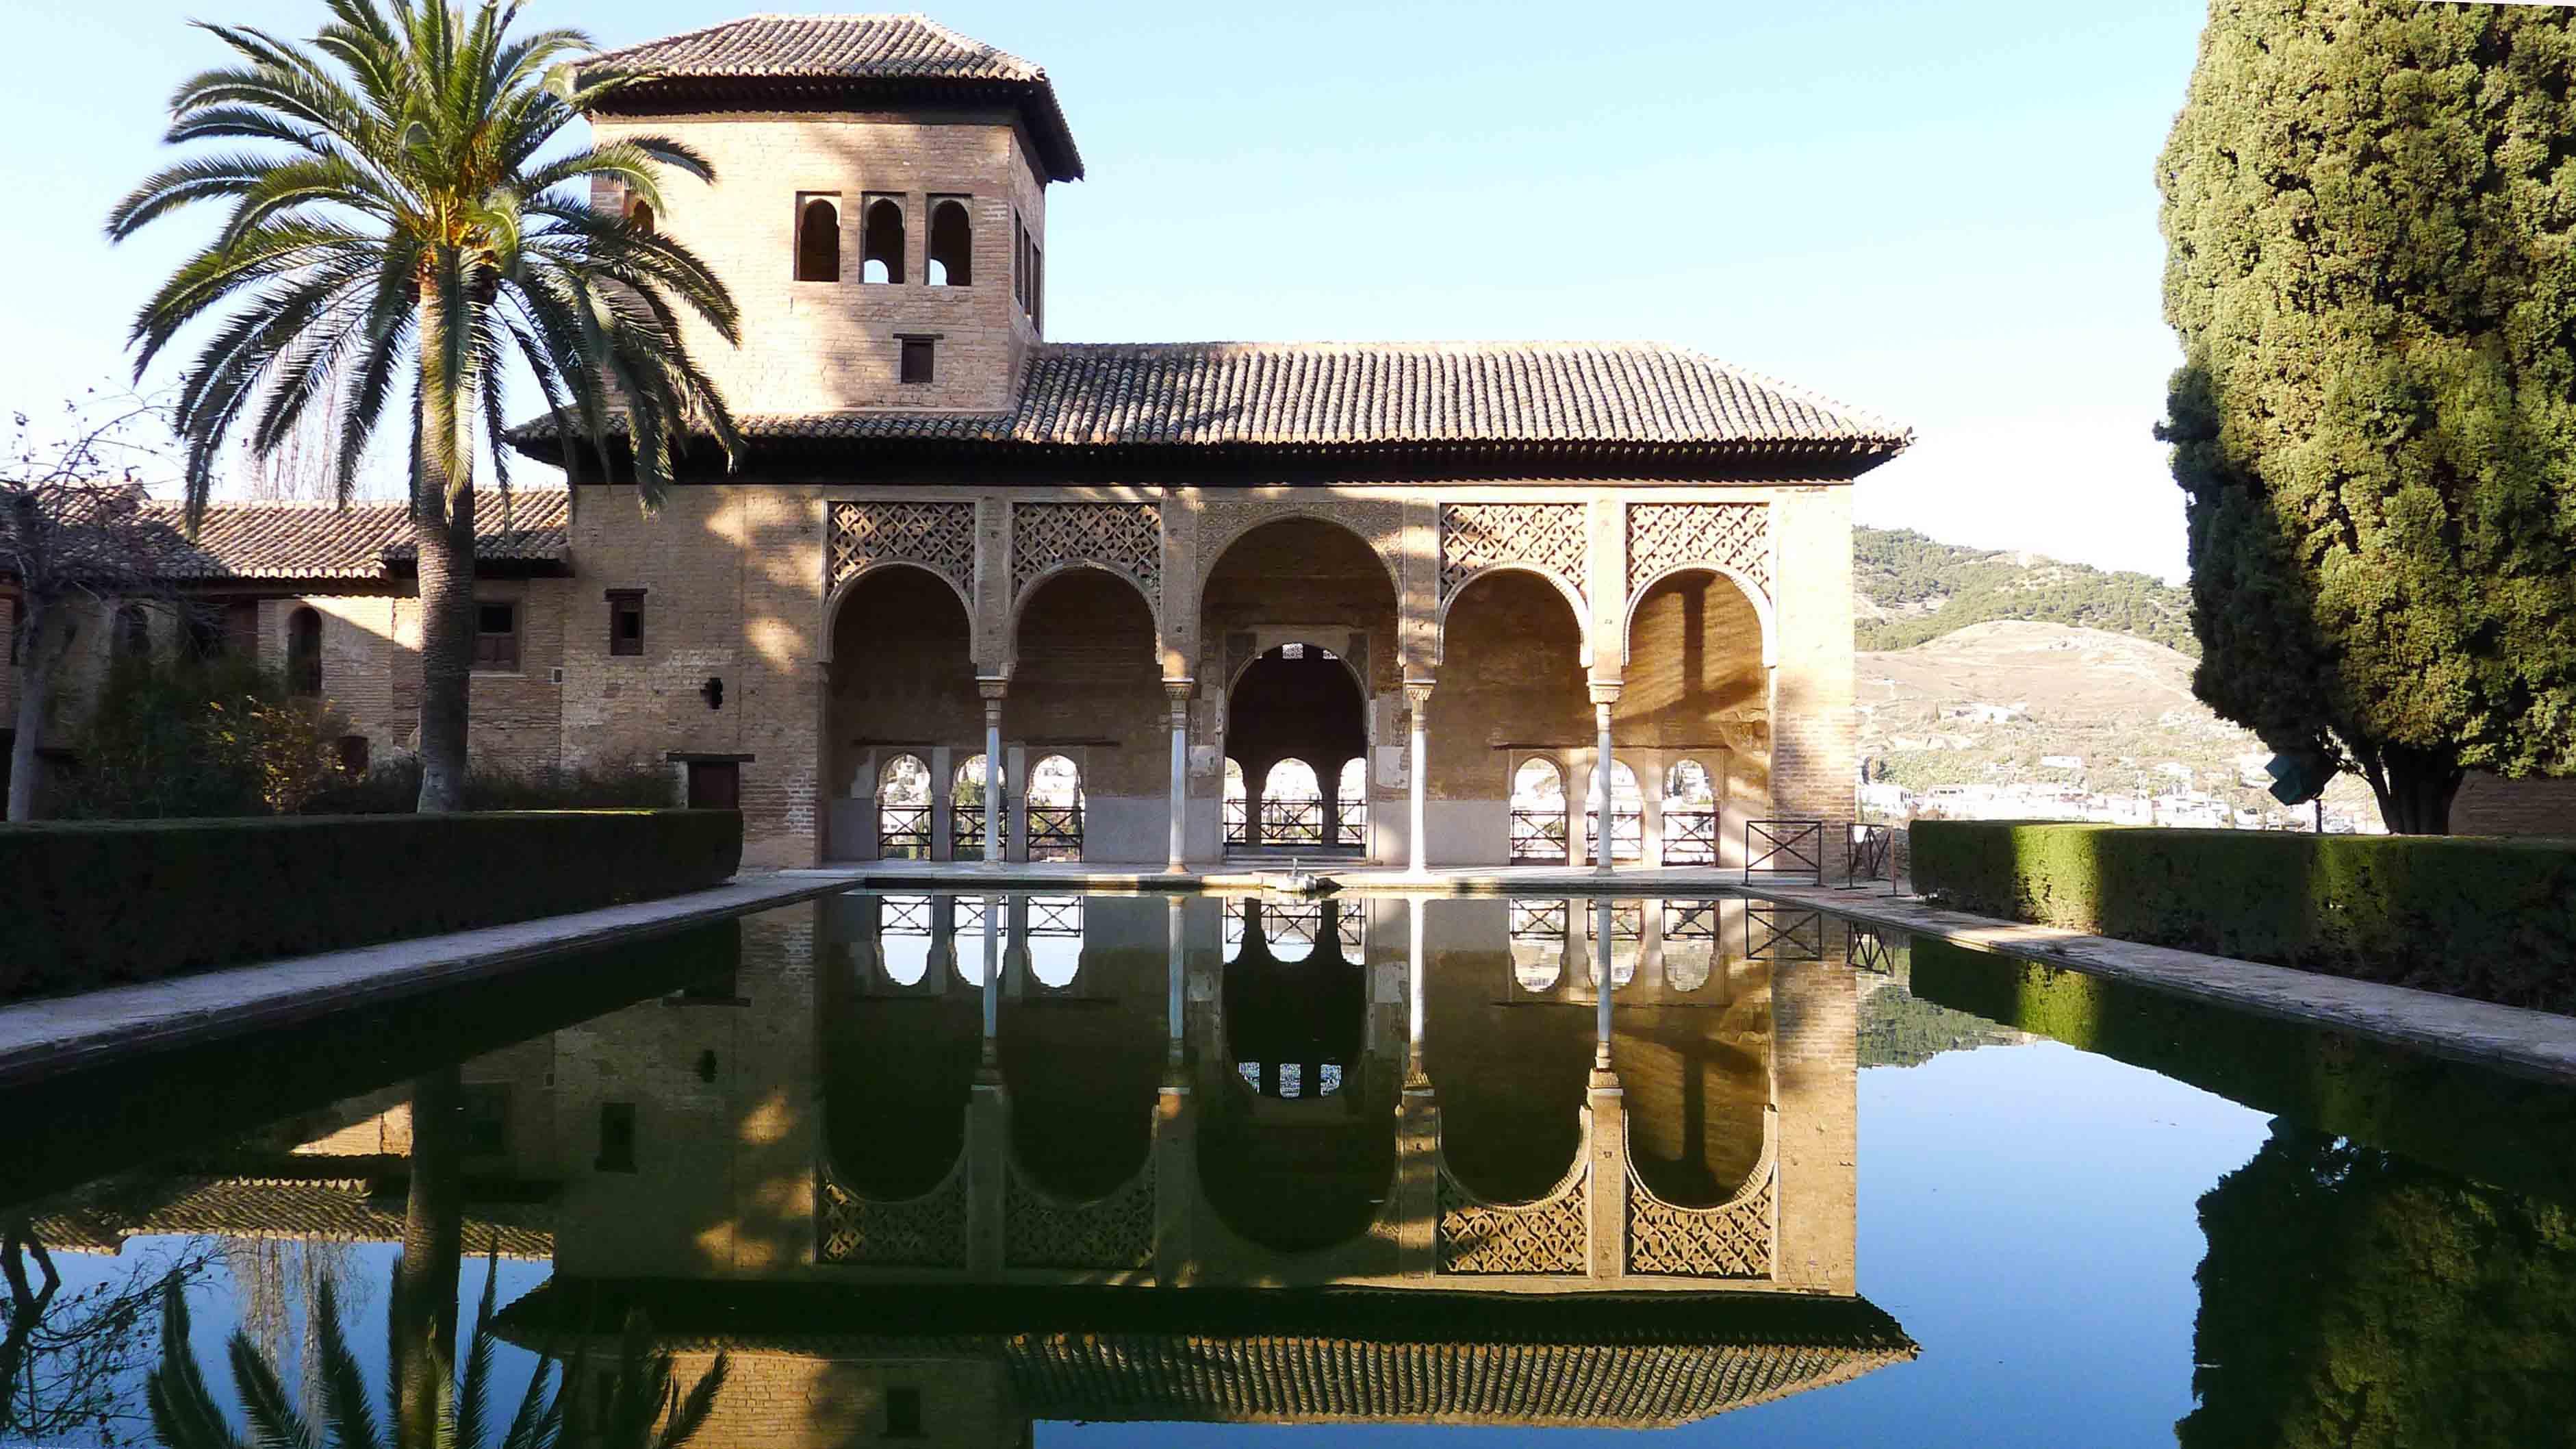 Alhambra The Arts Of Adventure